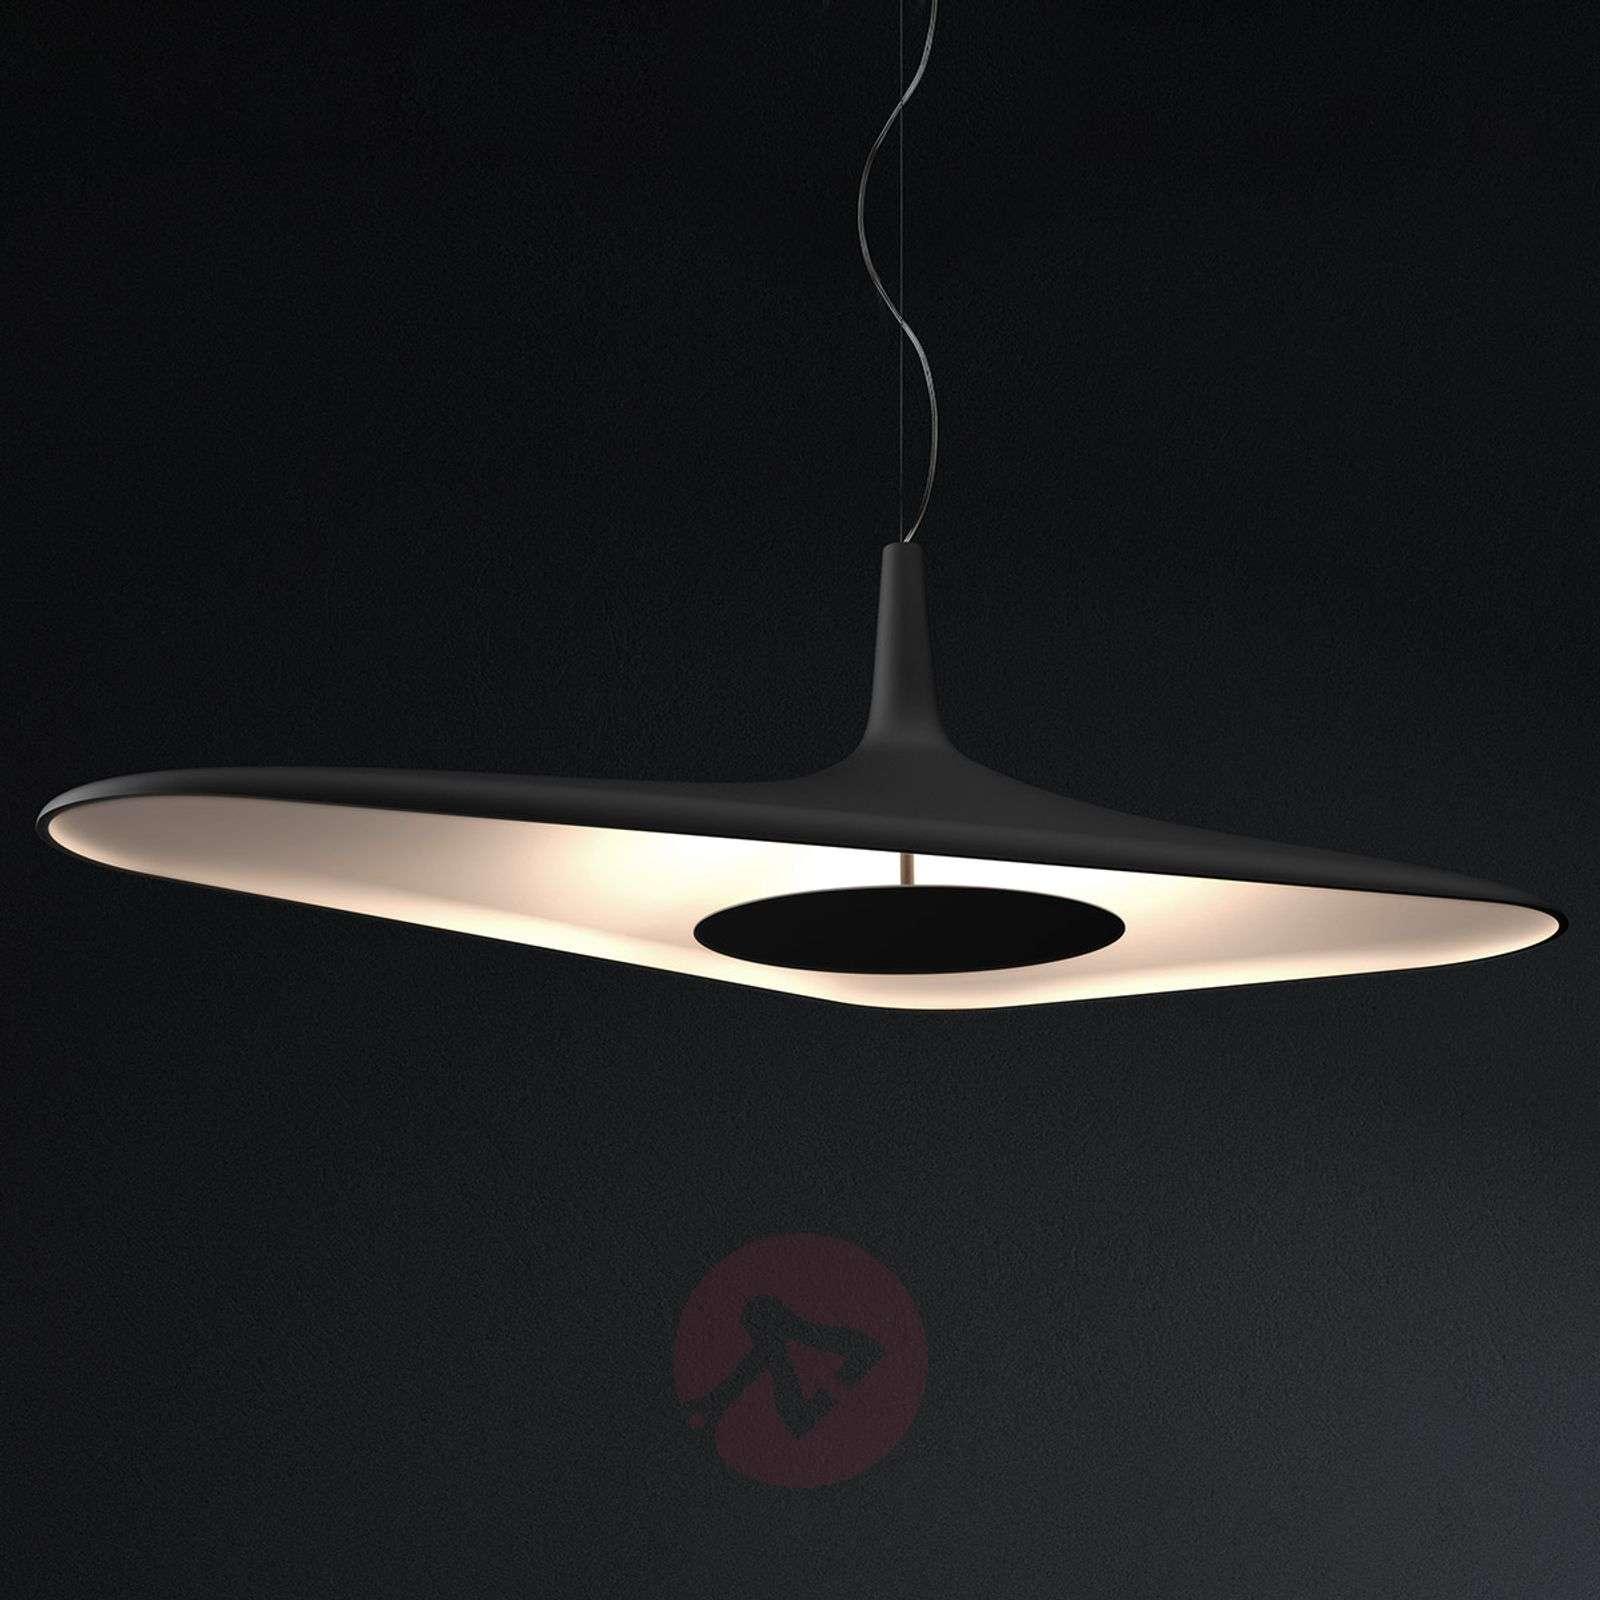 futuristic lighting. futuristic led pendant light soleil noir-6030176-02 lighting b